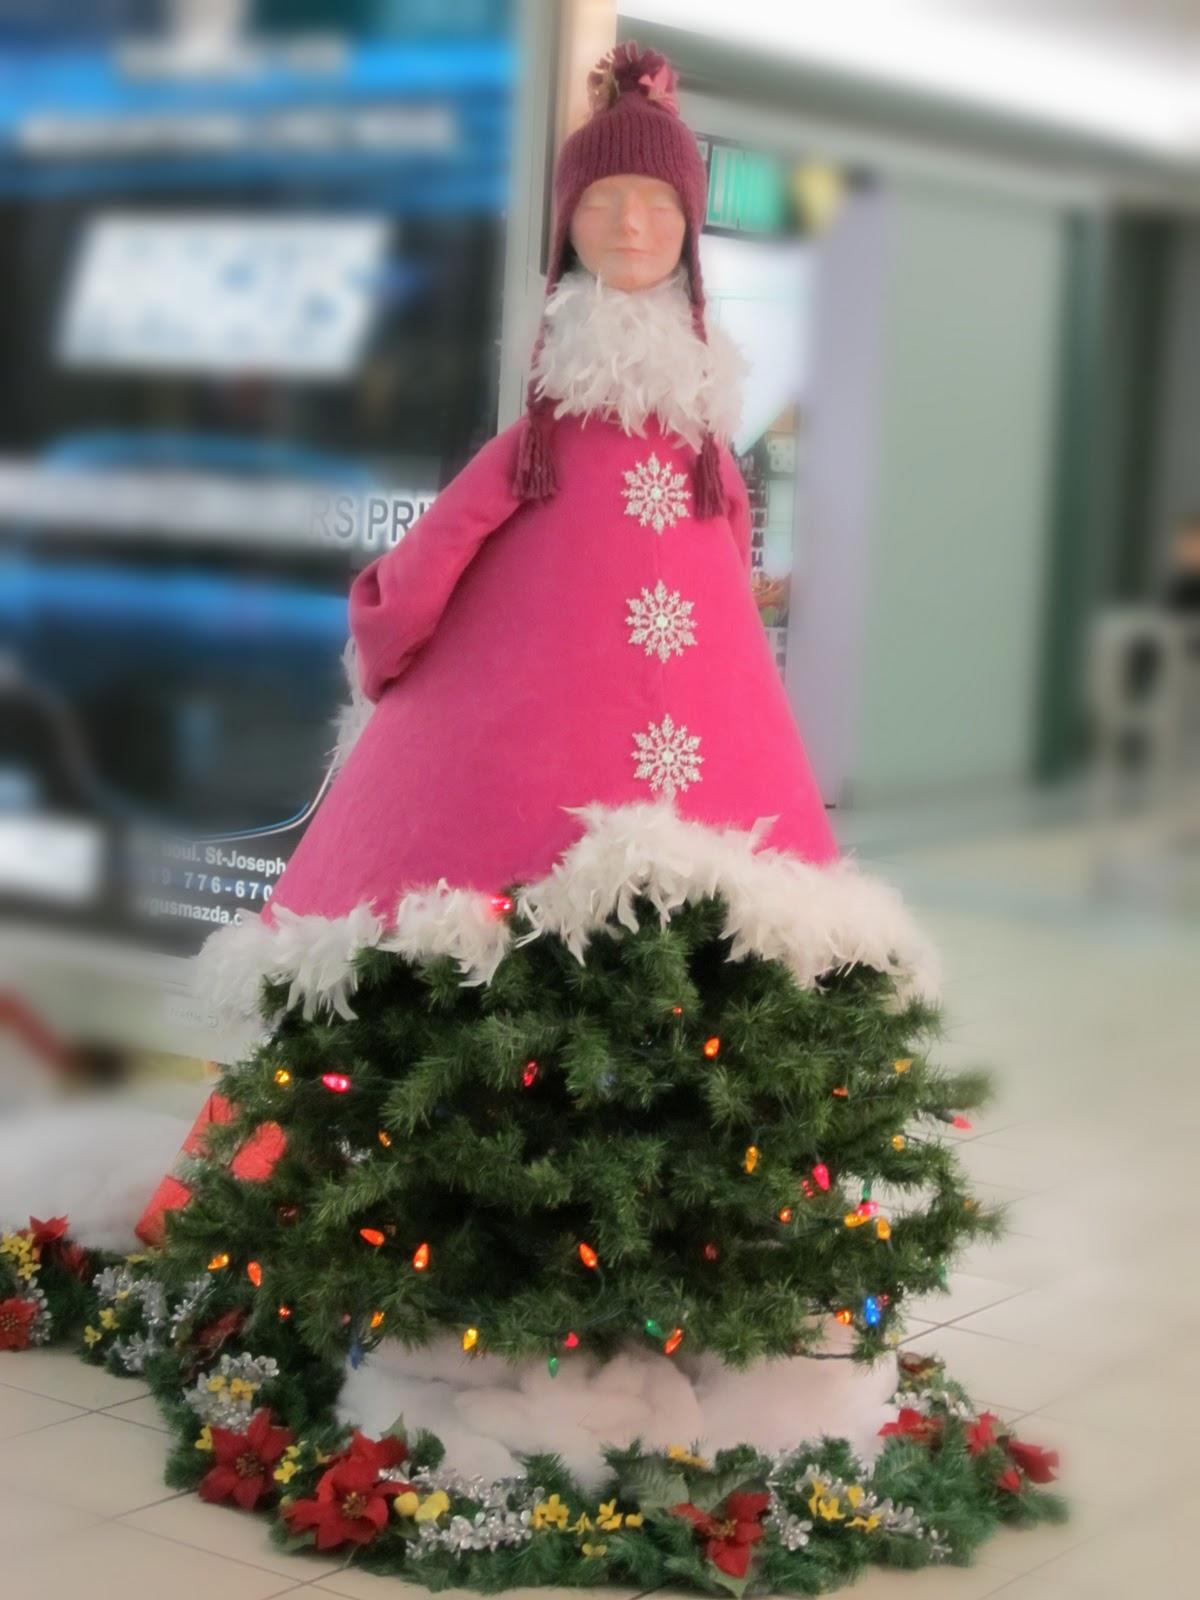 creepy christmas decorations - Creepy Christmas Decorations